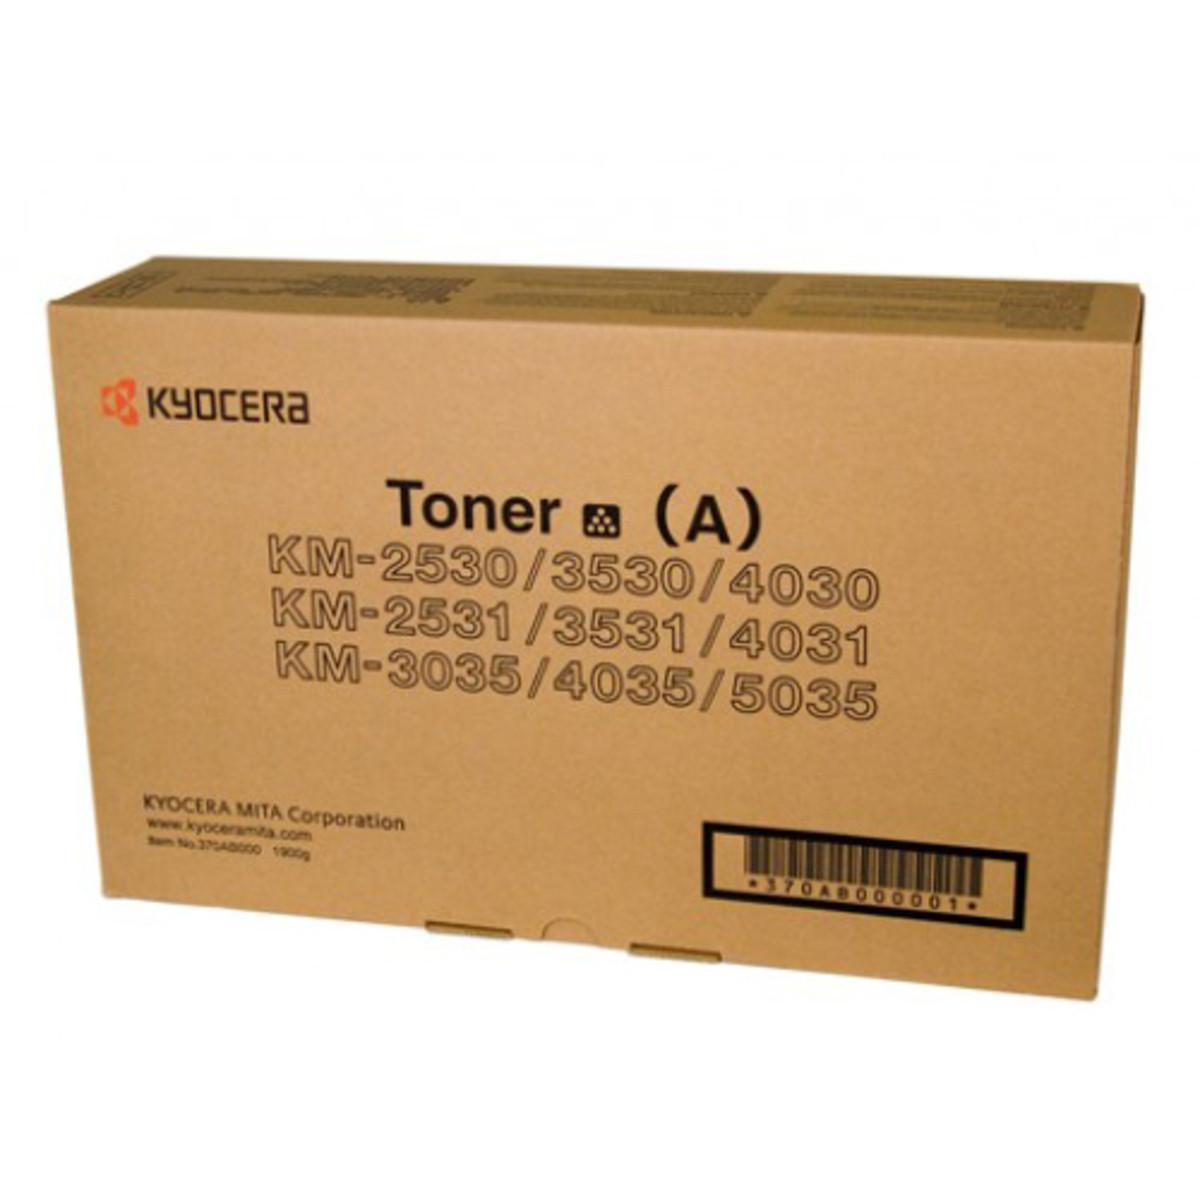 Kyocera 370AB00 Black Copier Cartridge